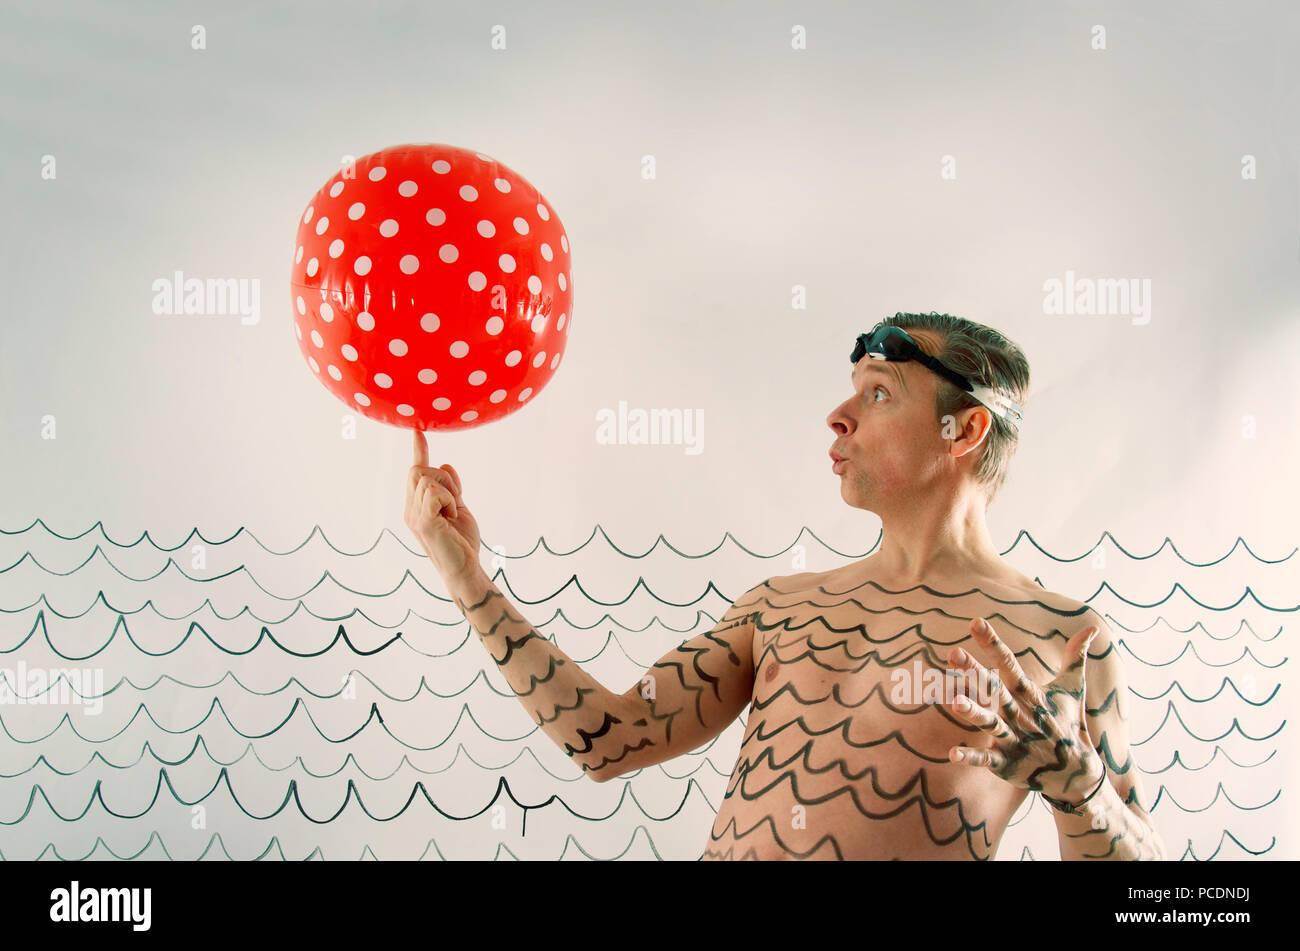 man,turning,beach ball - Stock Image